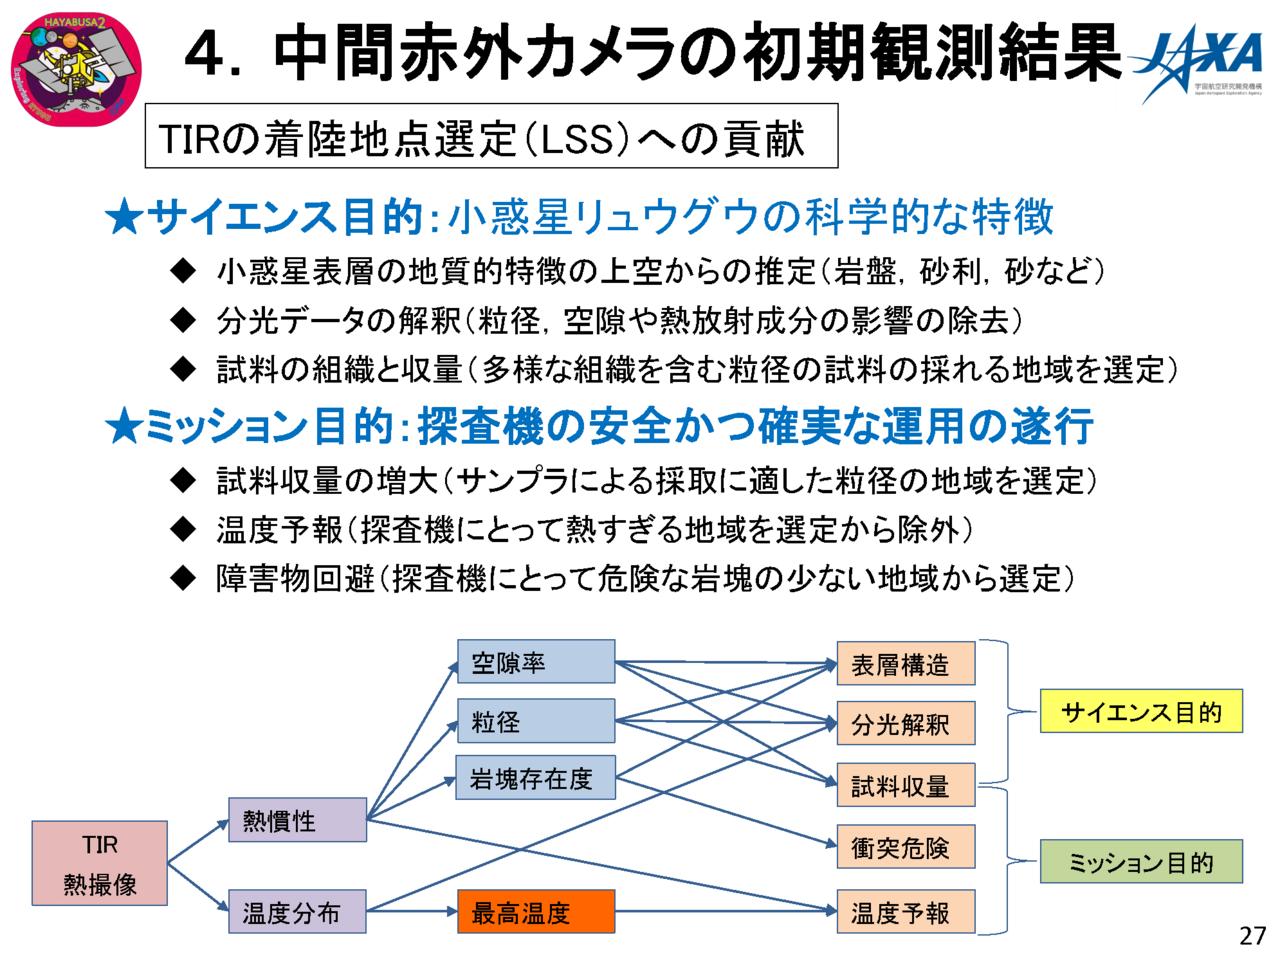 f:id:Imamura:20180719131722p:plain